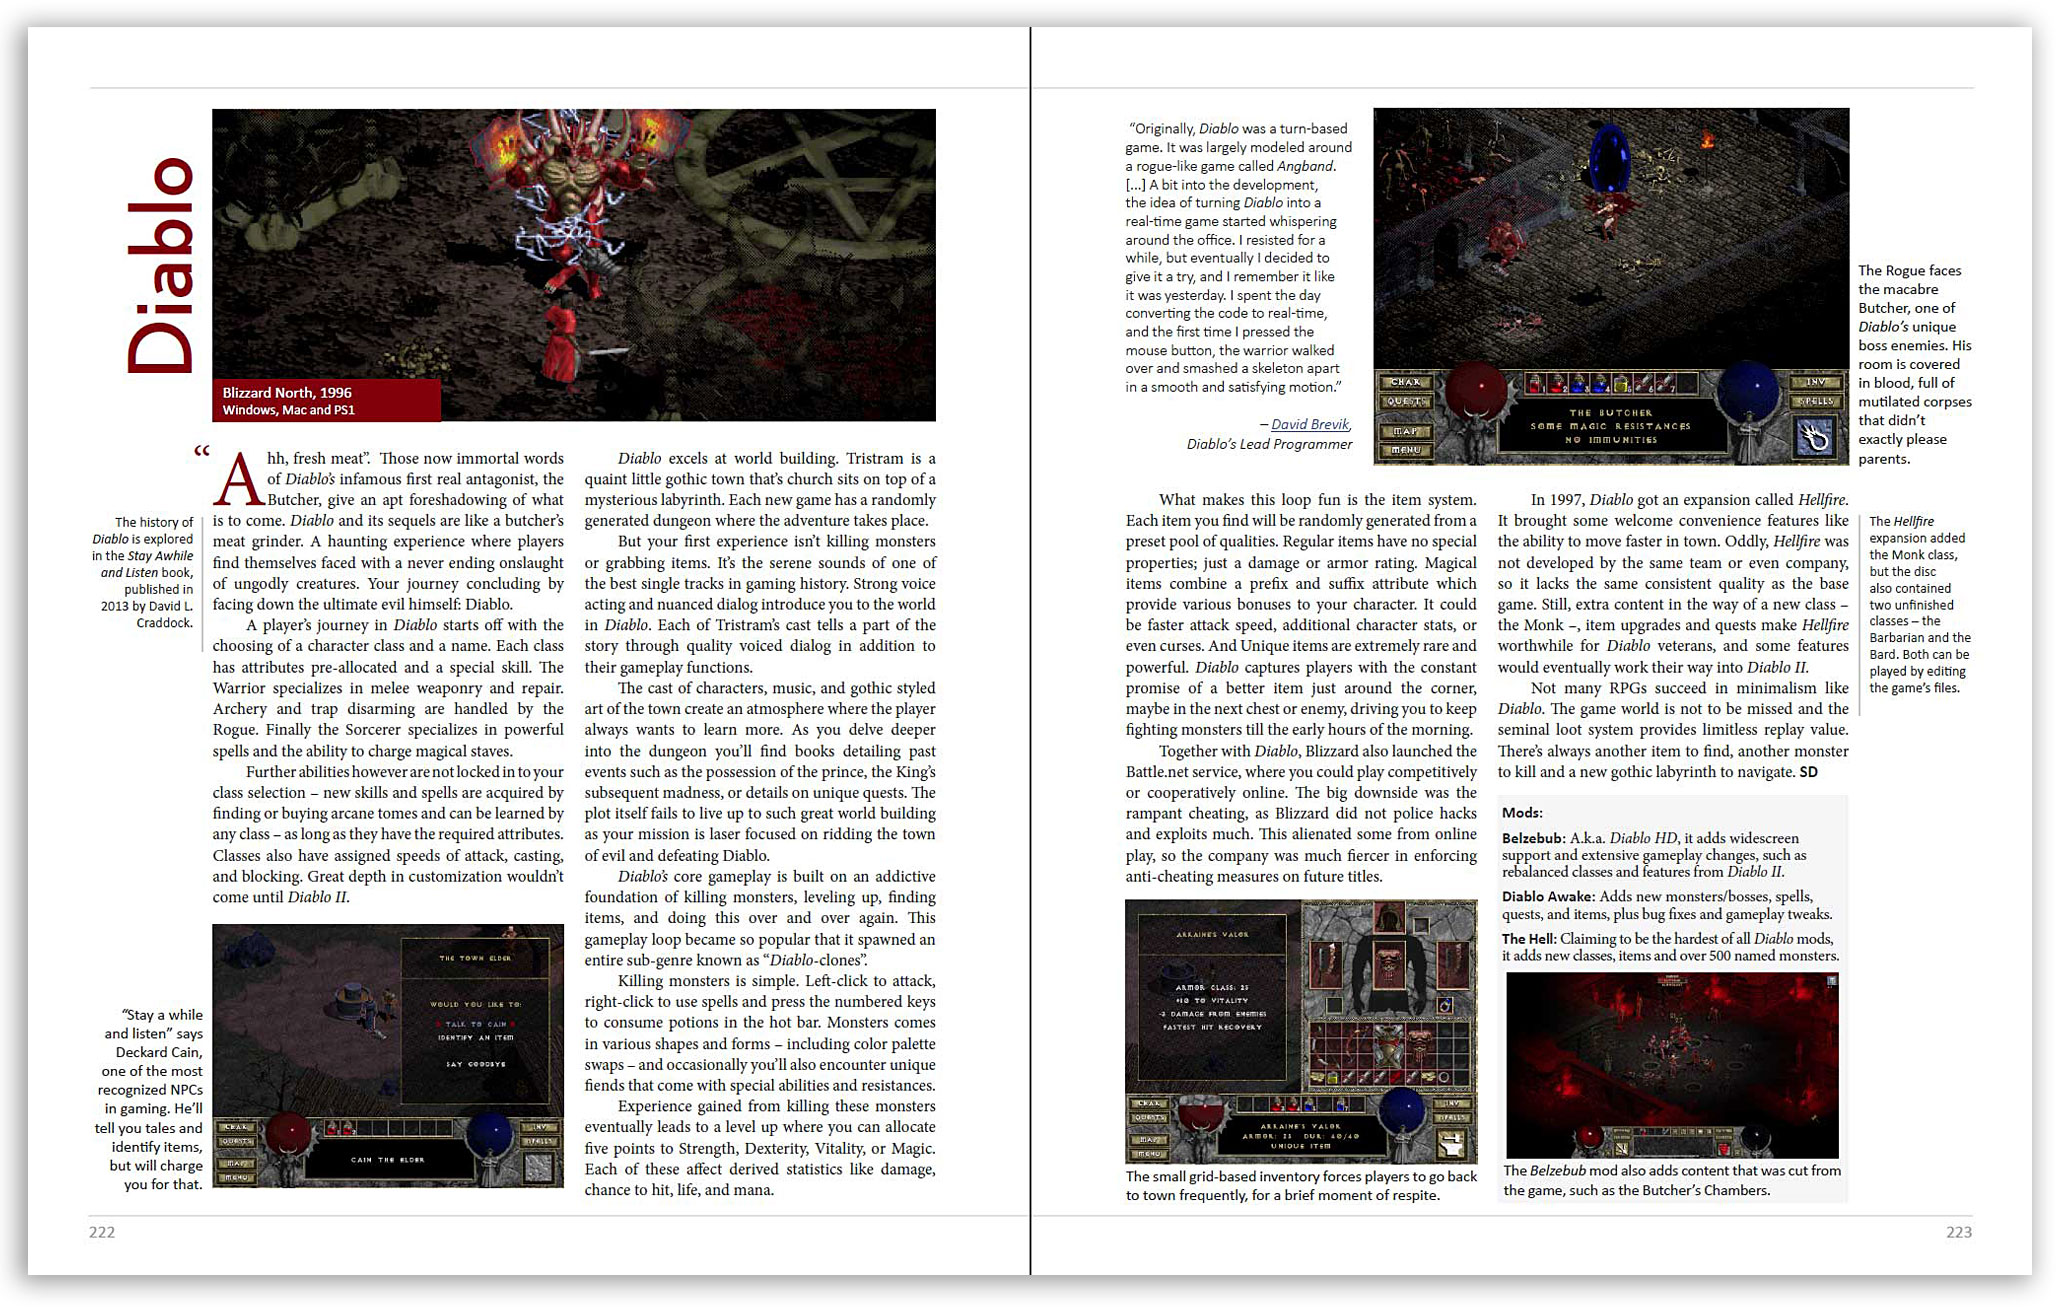 Buch: The CRPG Book Project - Diablo